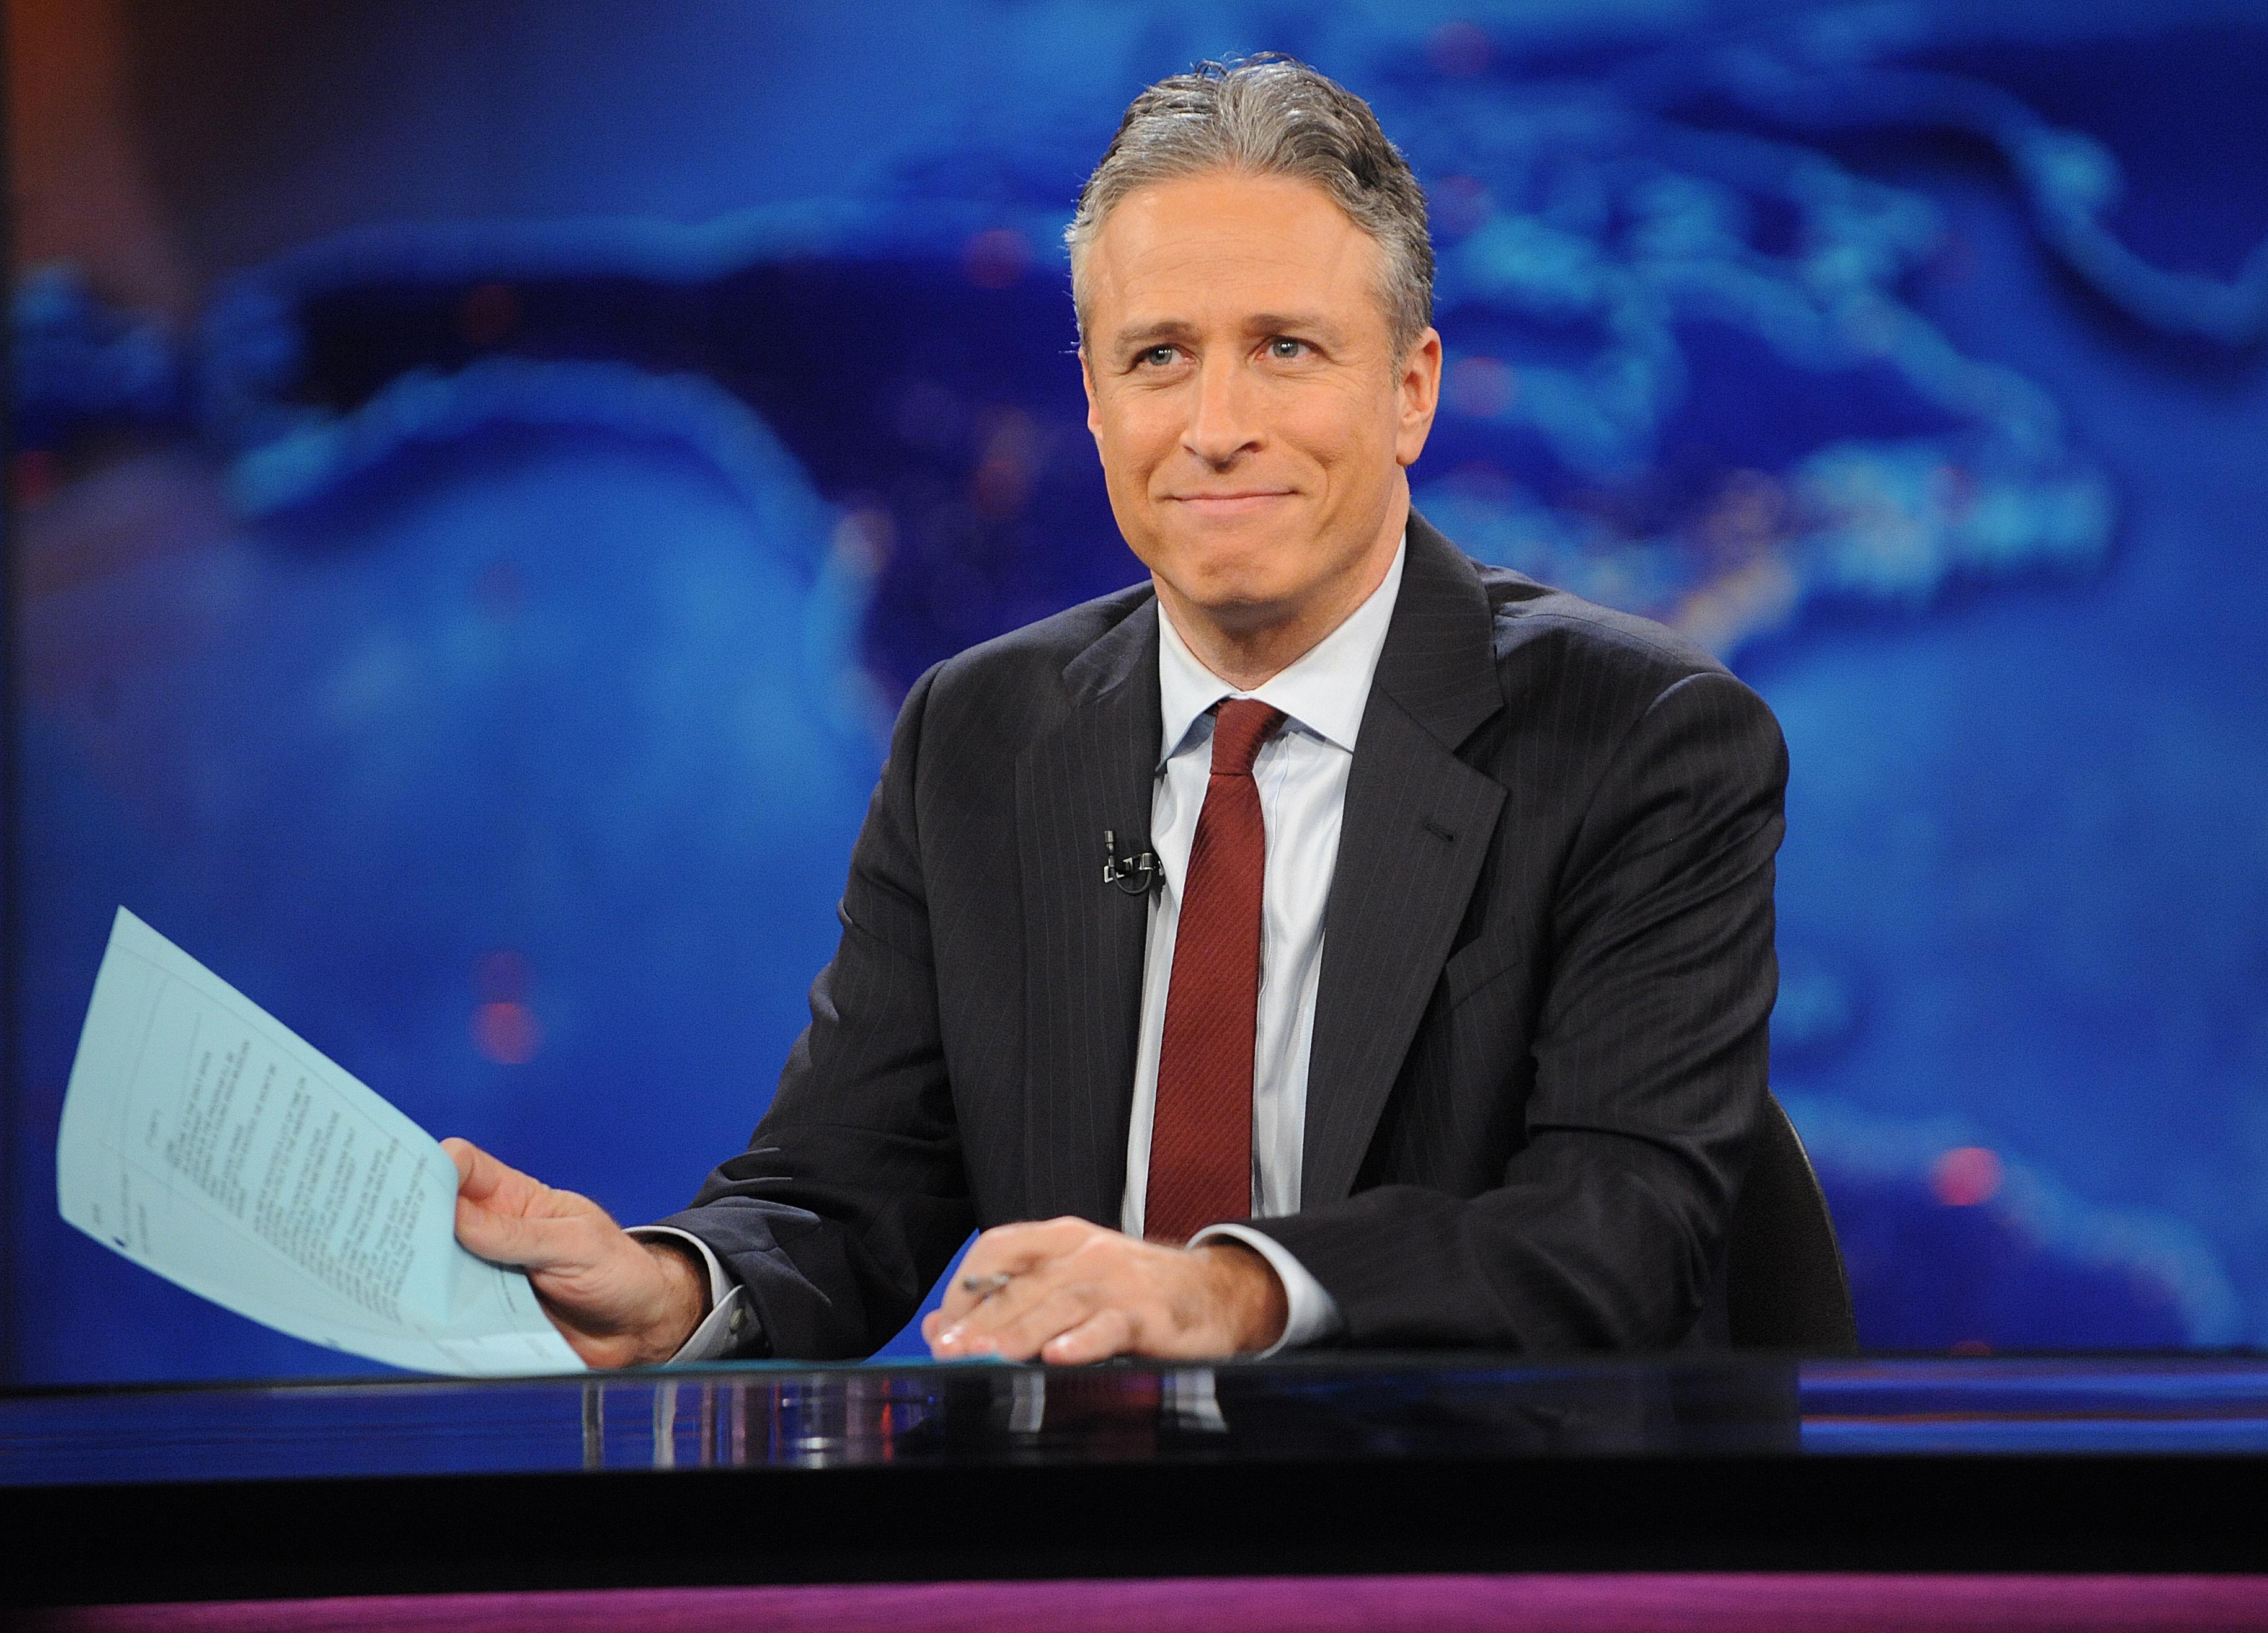 Image result for Jon Stewart photo